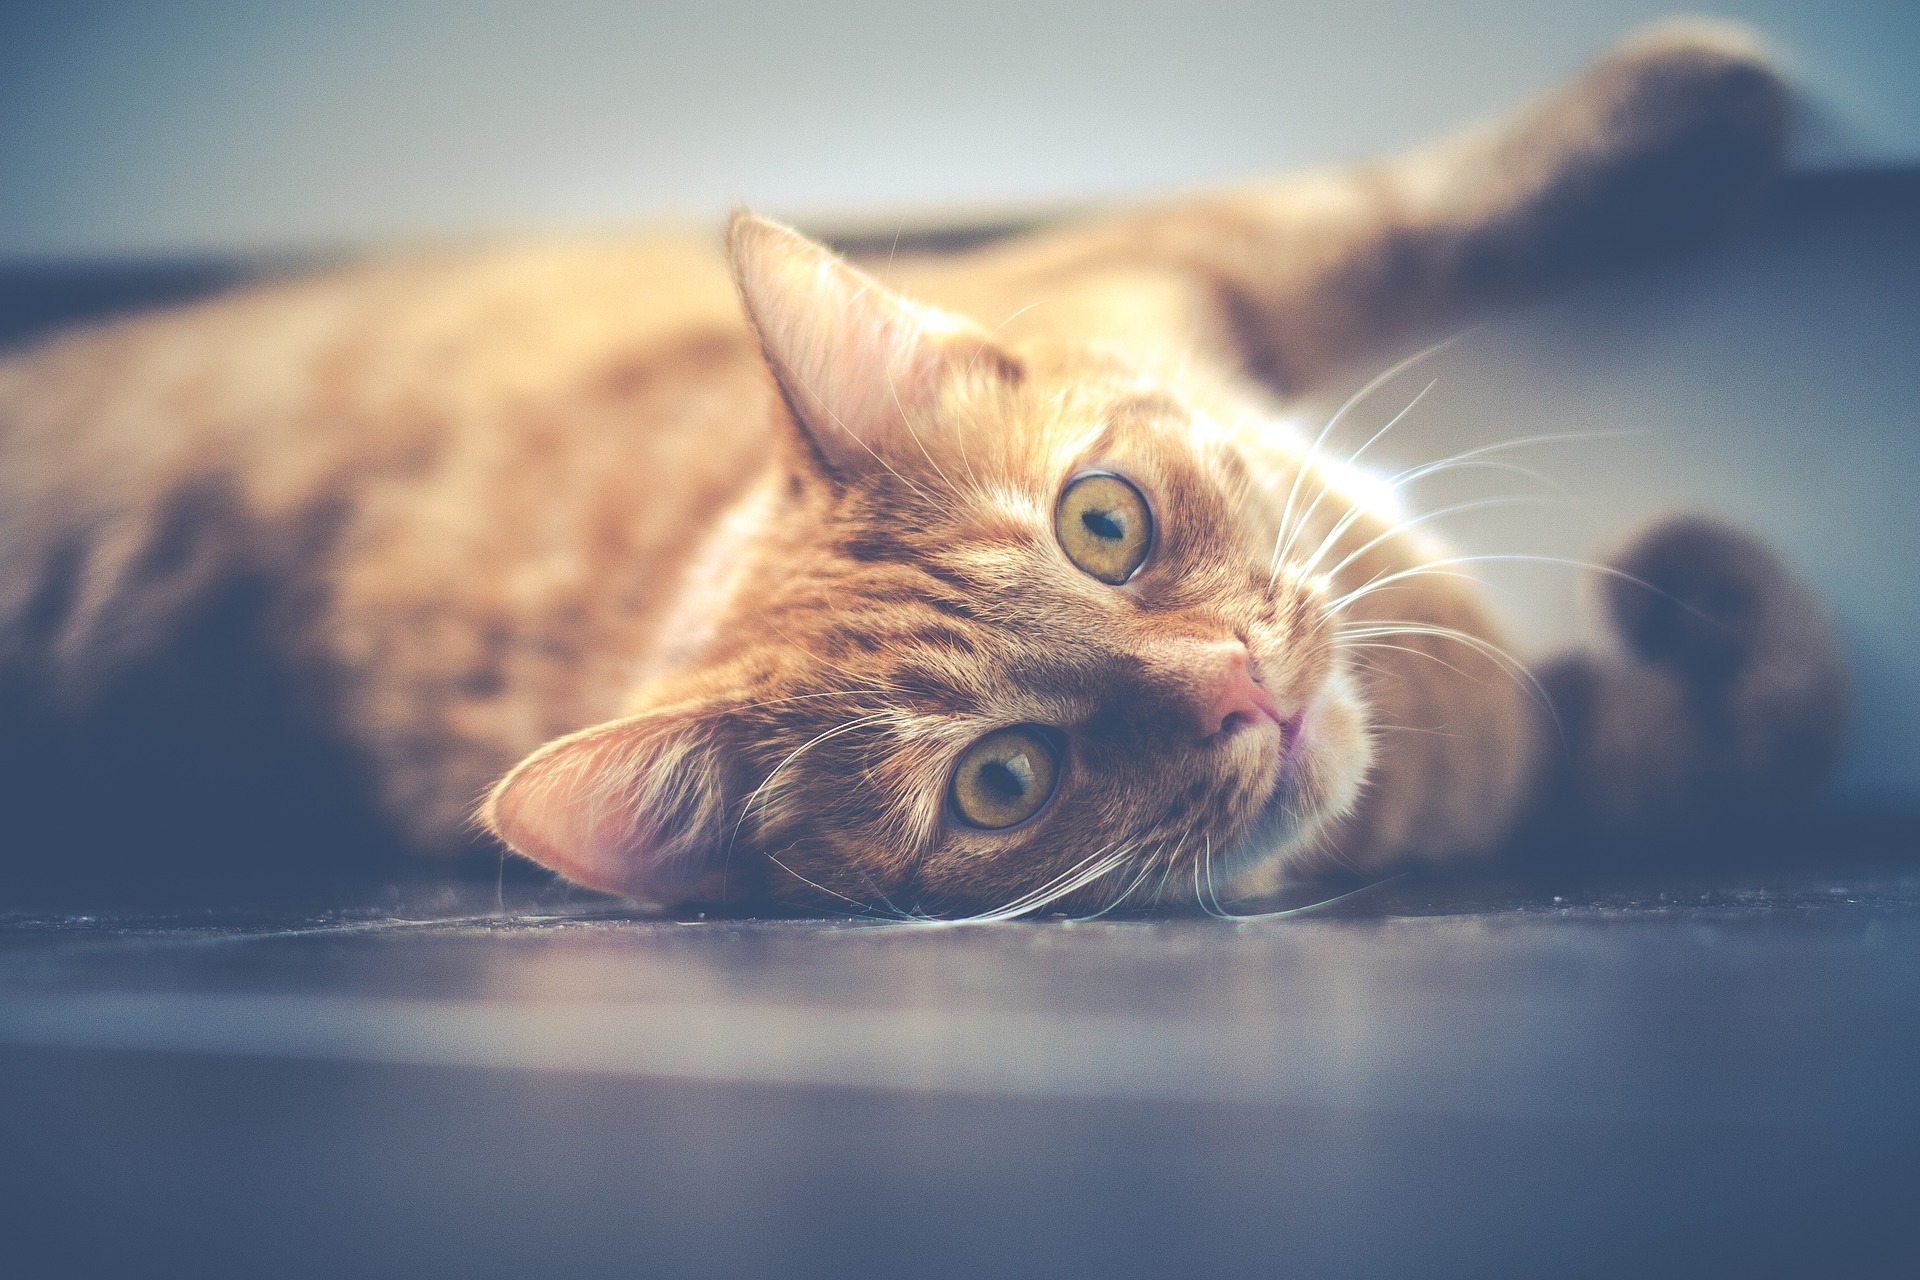 cat-1044914_1920.jpg